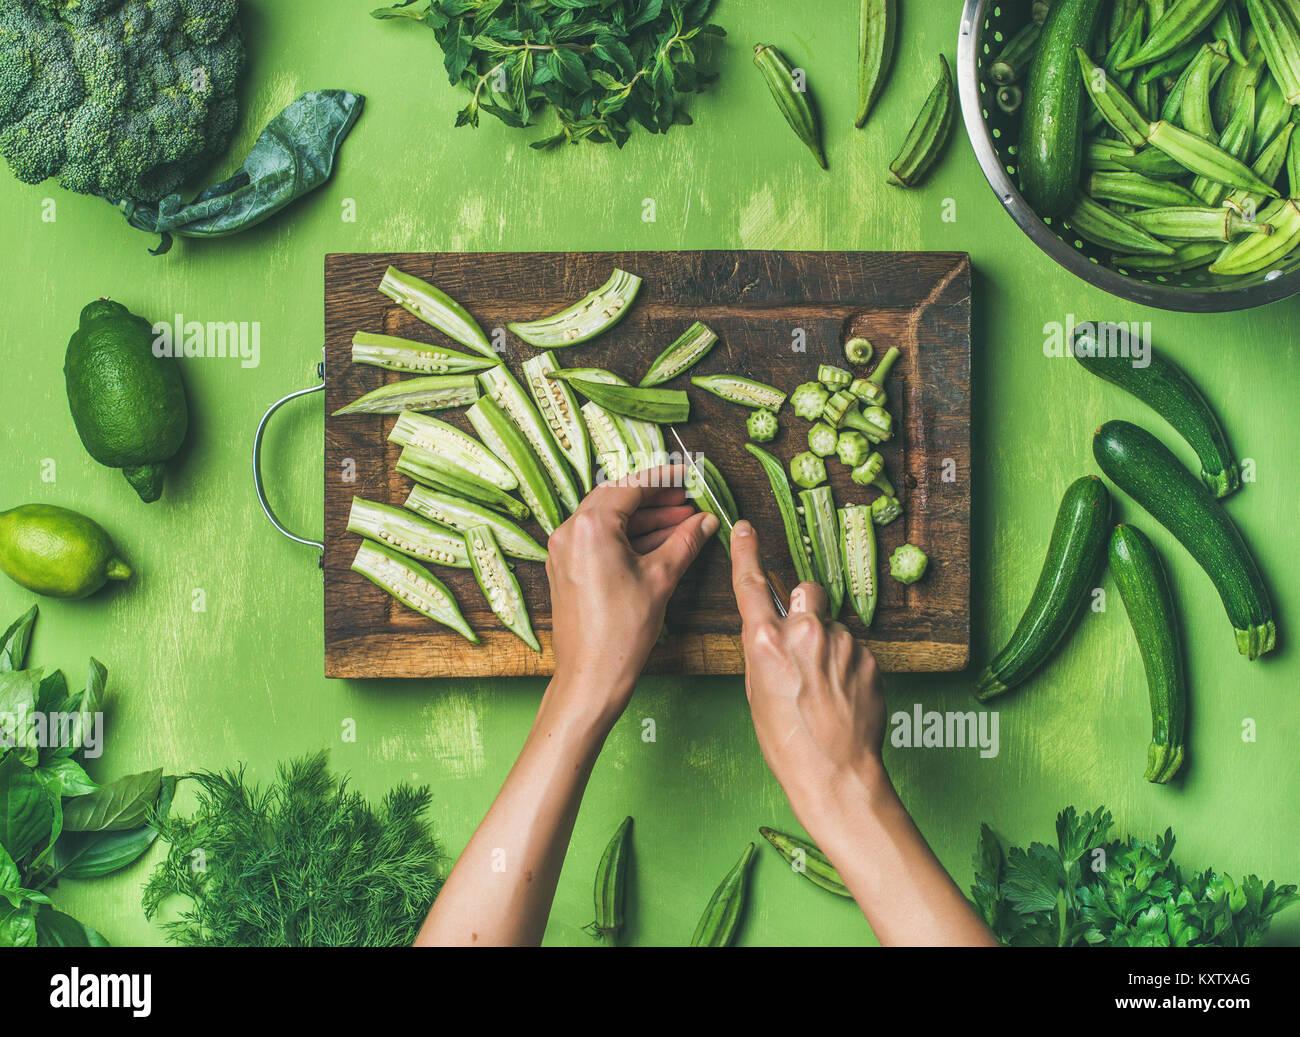 Flat-lay of healthy green vegan cooking ingredients - Stock Image